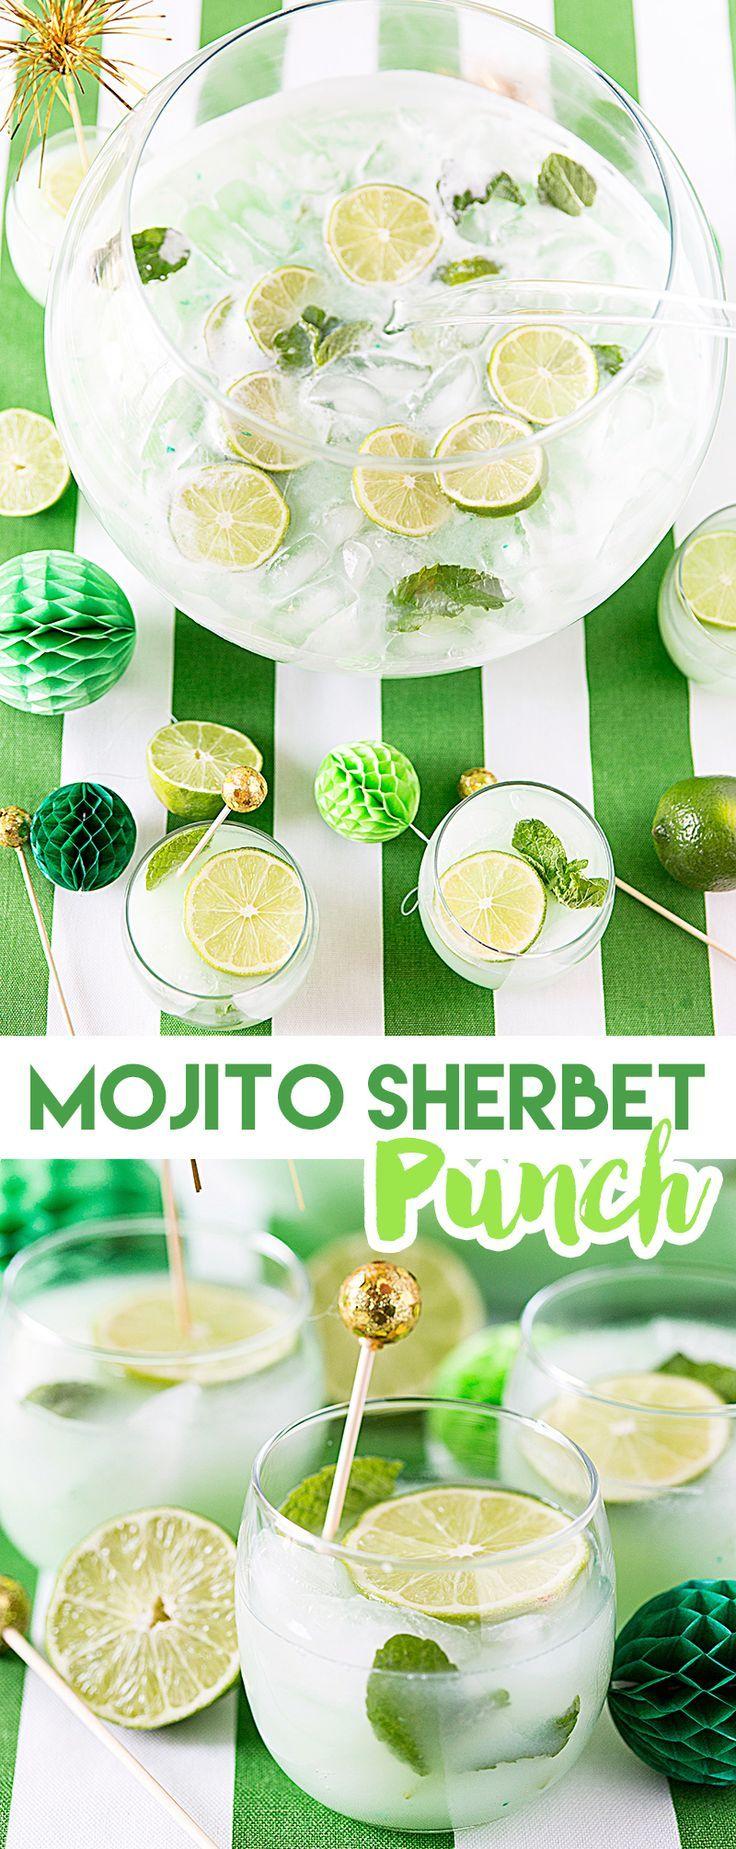 St. Patrick's Day Mojito Sherbet Punch Recipe